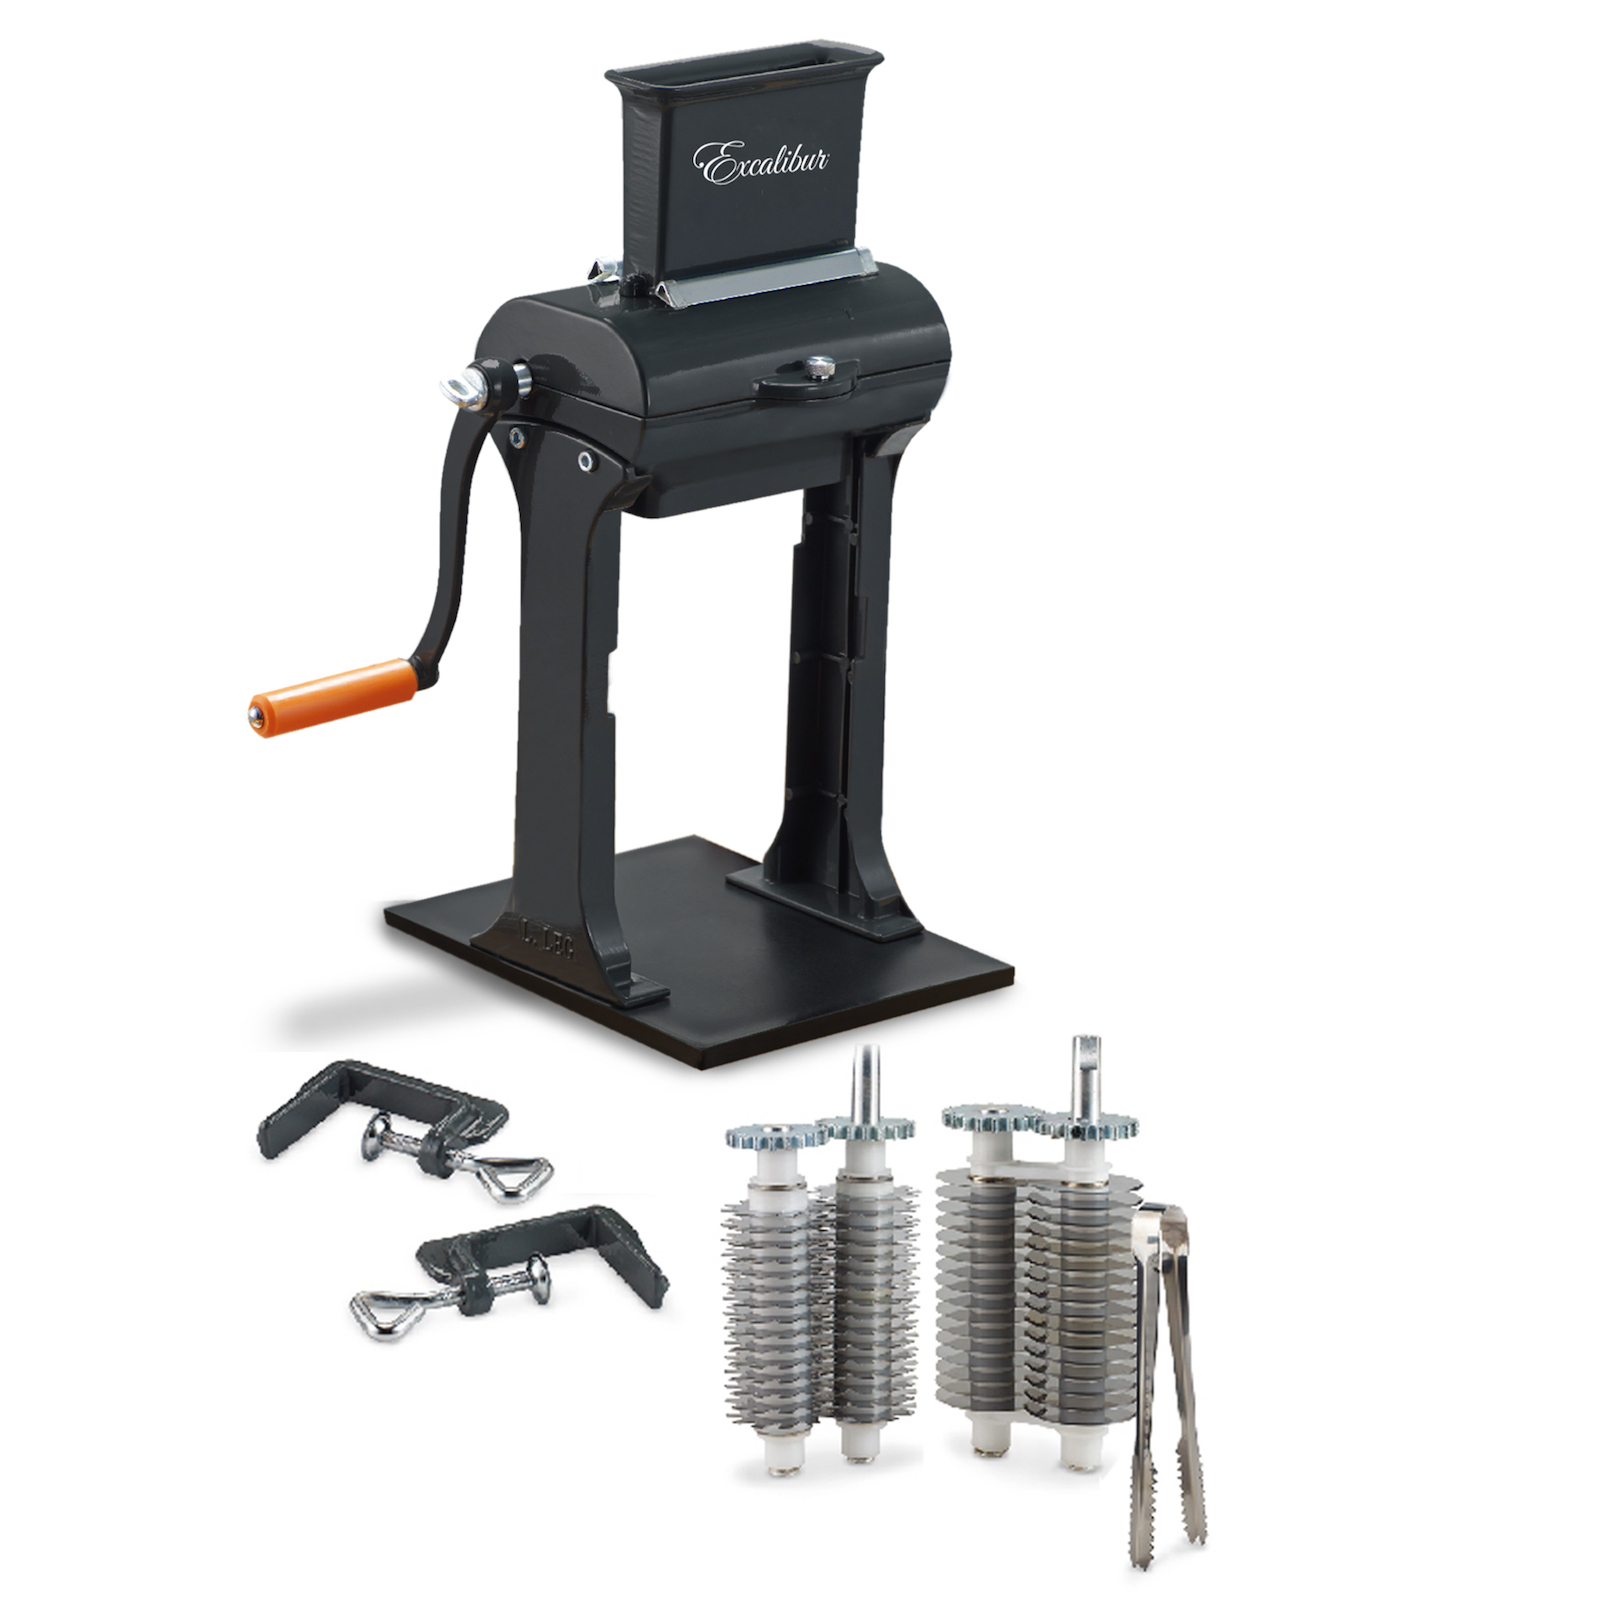 Excalibur Manual Meat Tenderizer And Jerky Slicer Kit